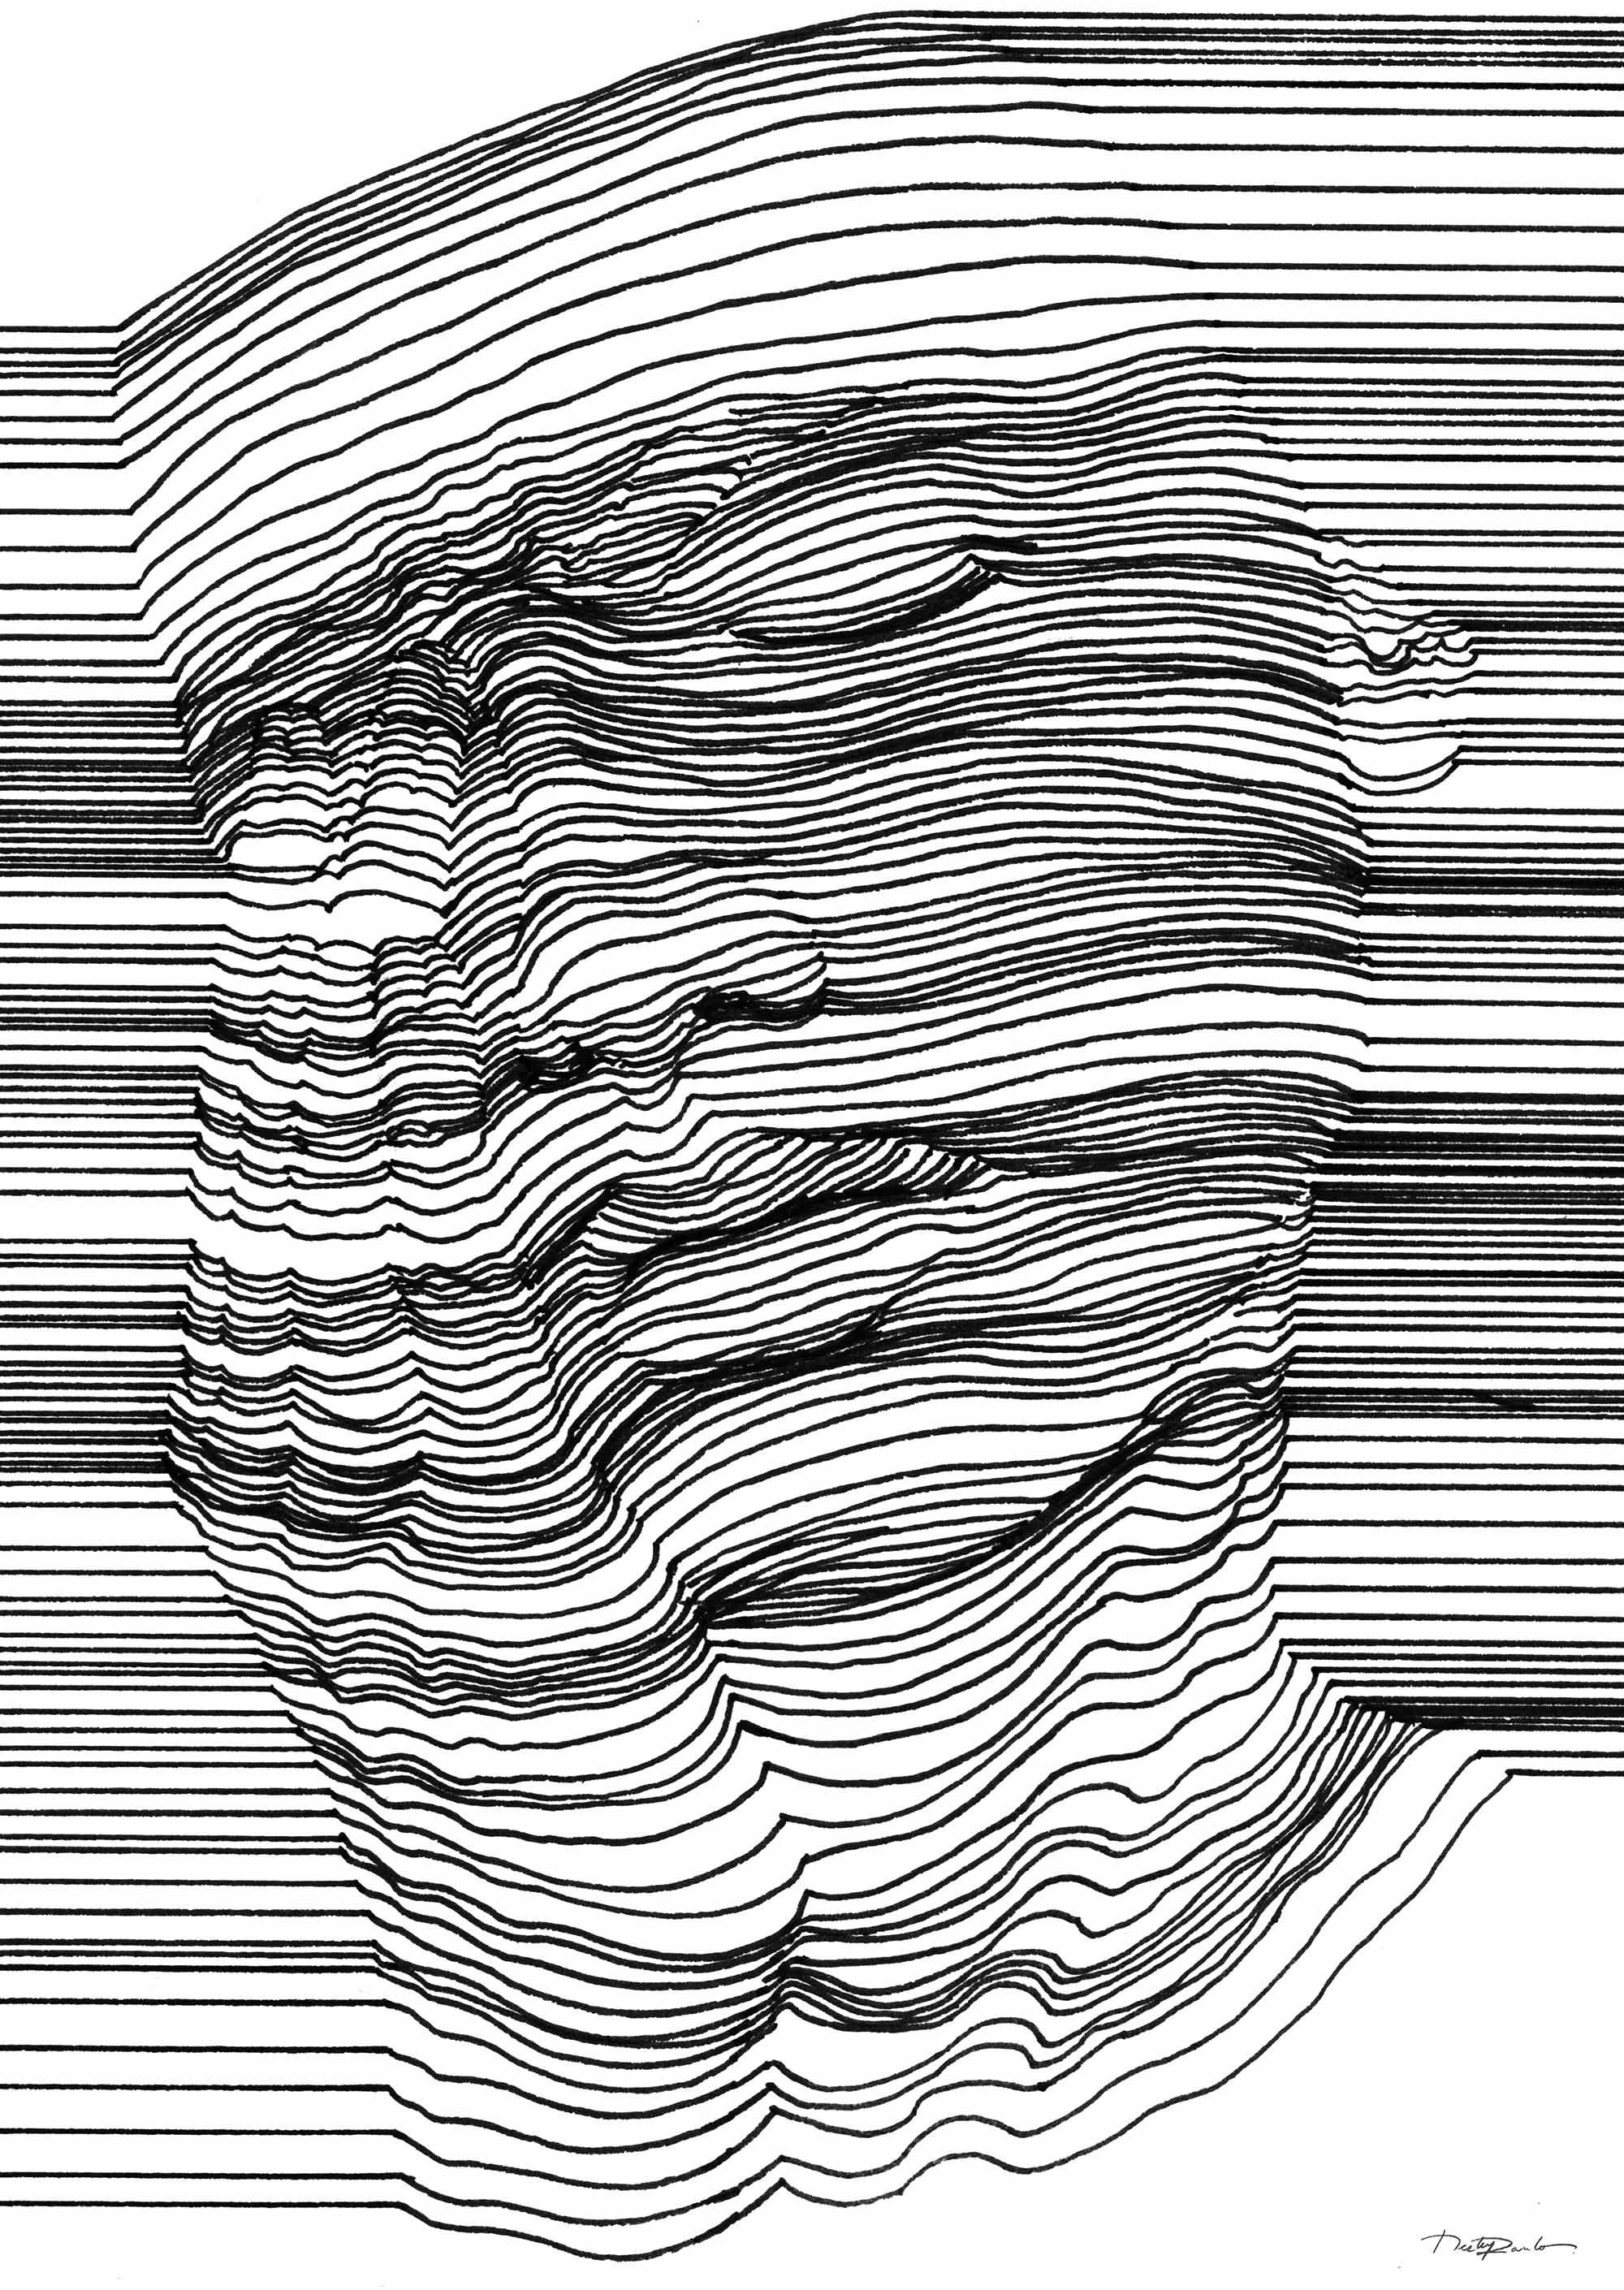 3d Line Drawing : Sensual d line art by nester formentera